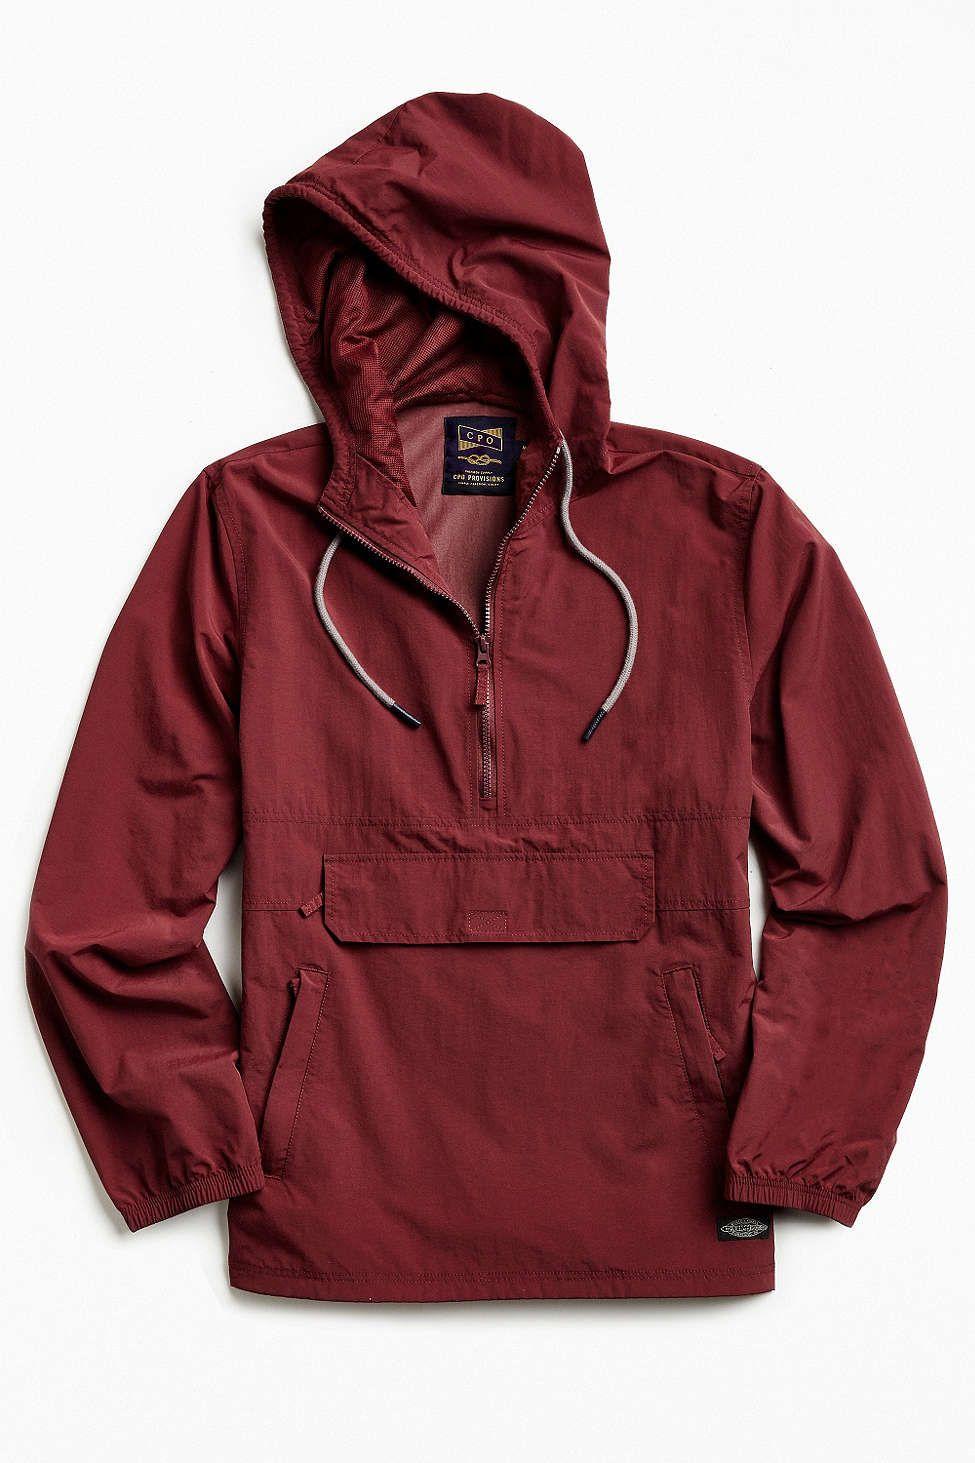 CPO Citywide Anorak Jacket - Urban Outfitters Moda Maschile 8050045eb4e